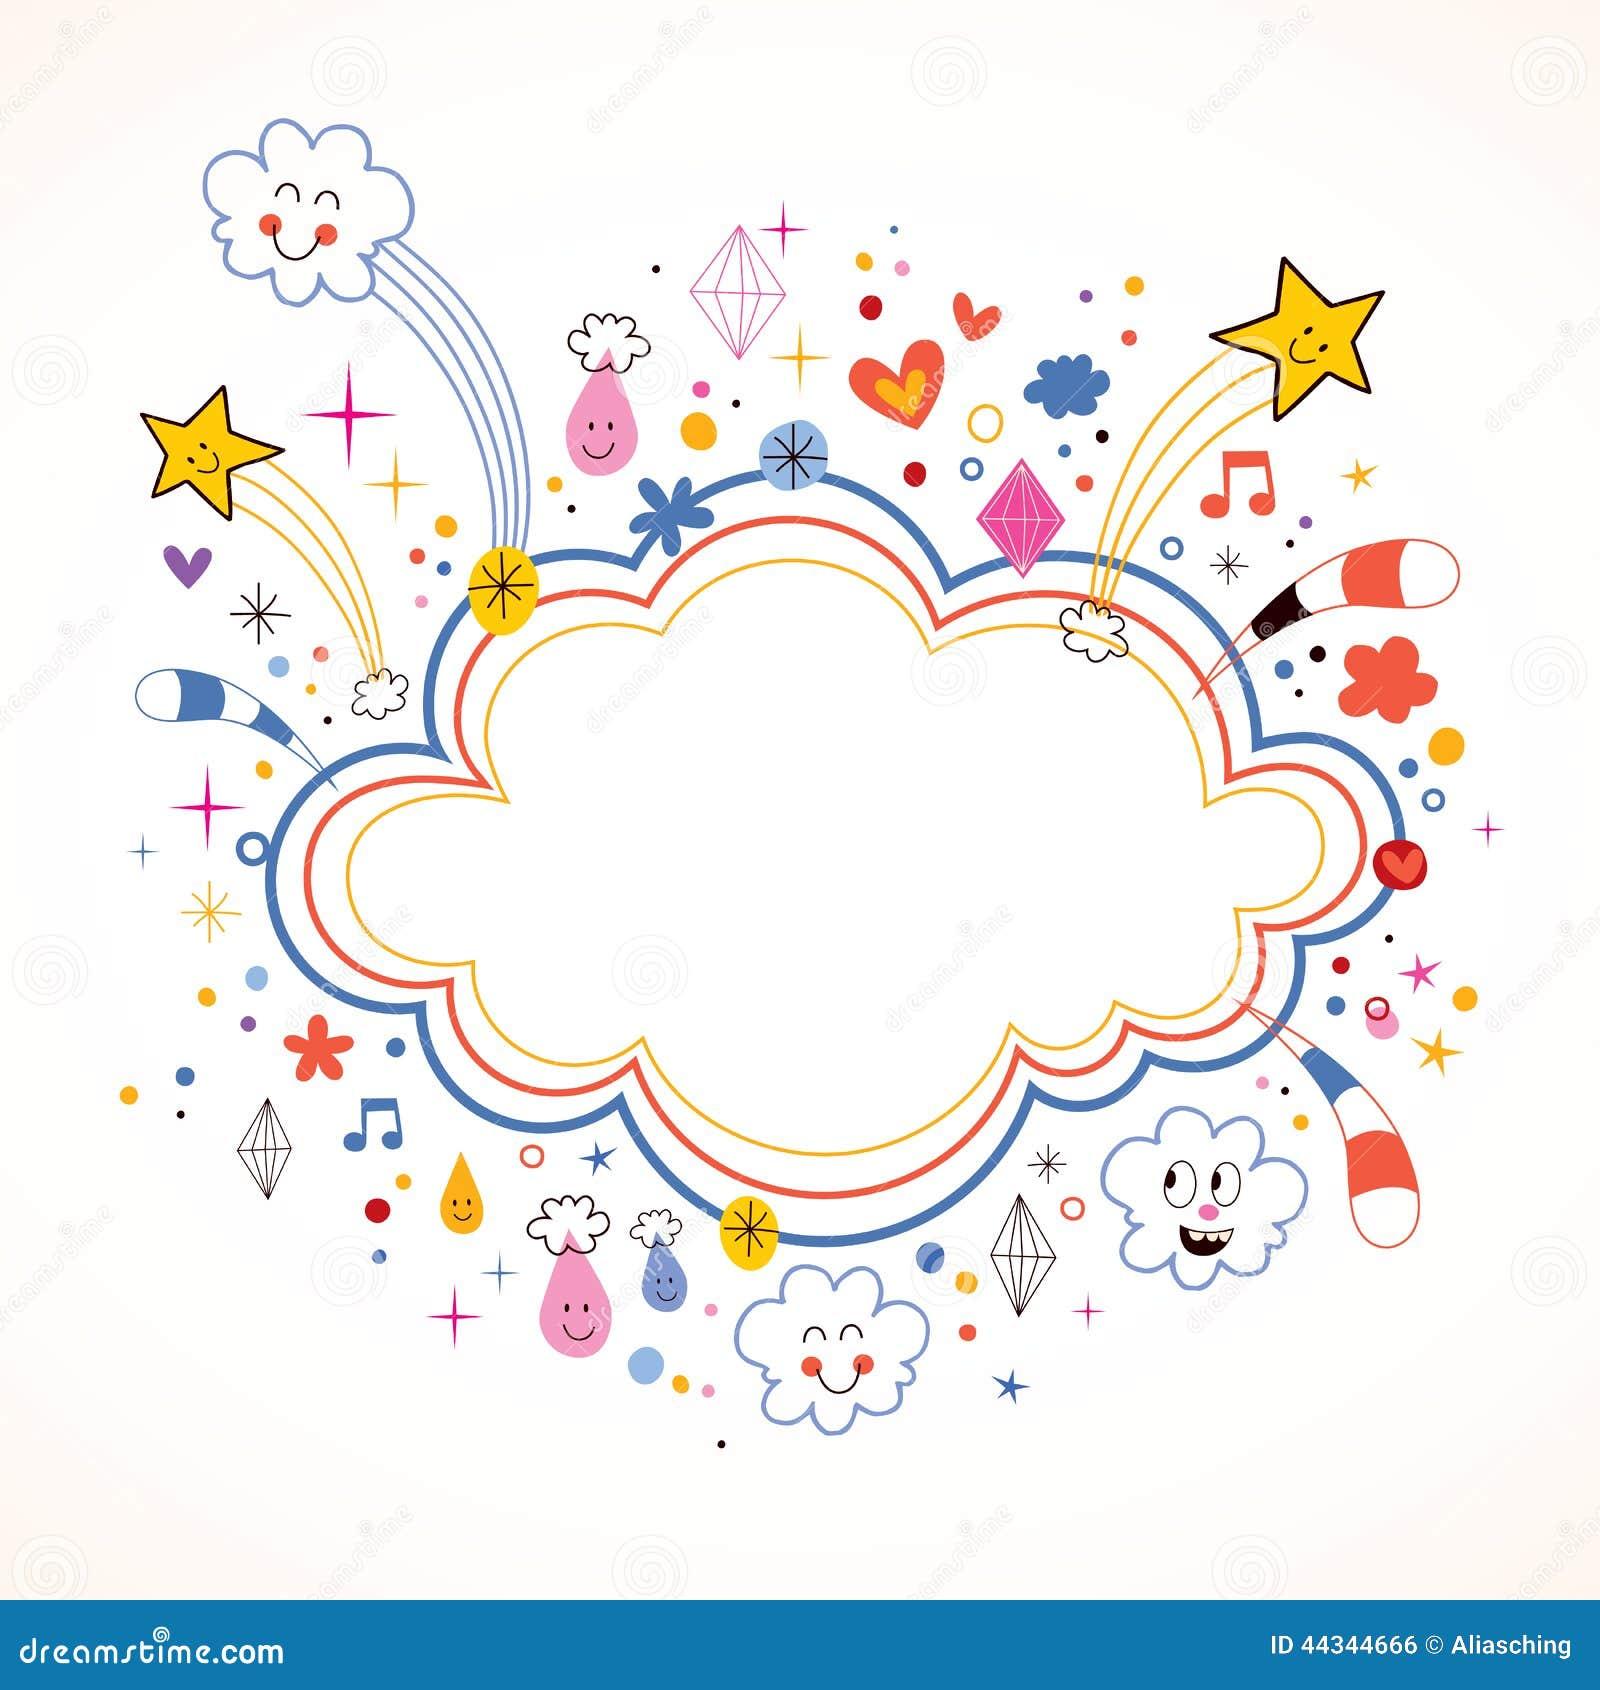 star bursts cartoon cloud shape banner frame royalty free stock image